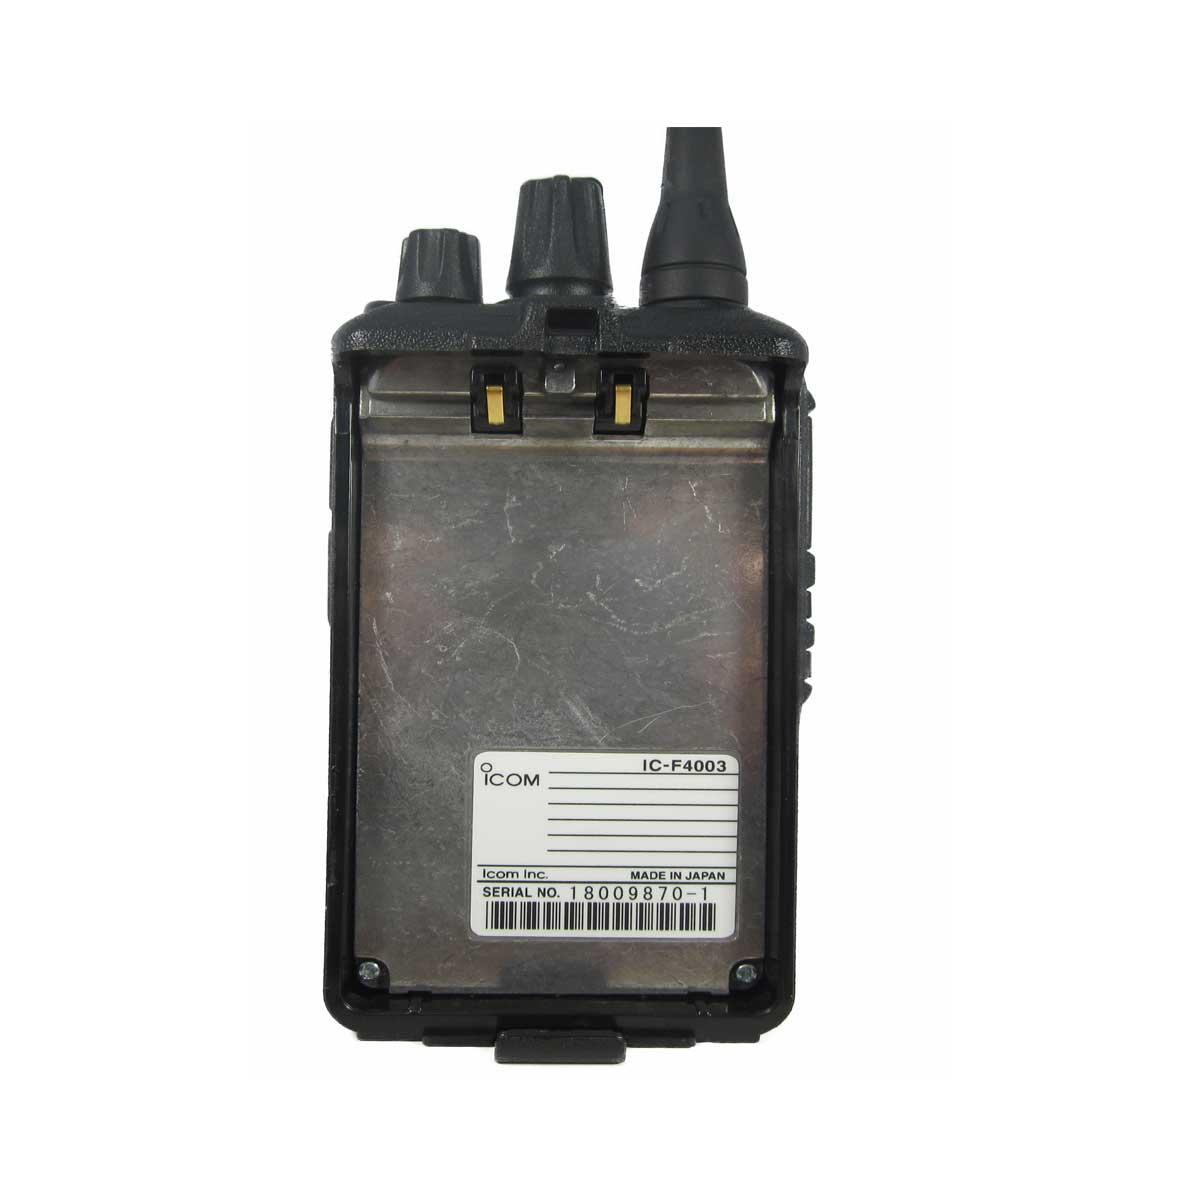 Radio Icom IC-F4003 Analógico UHF 450-512 MHz